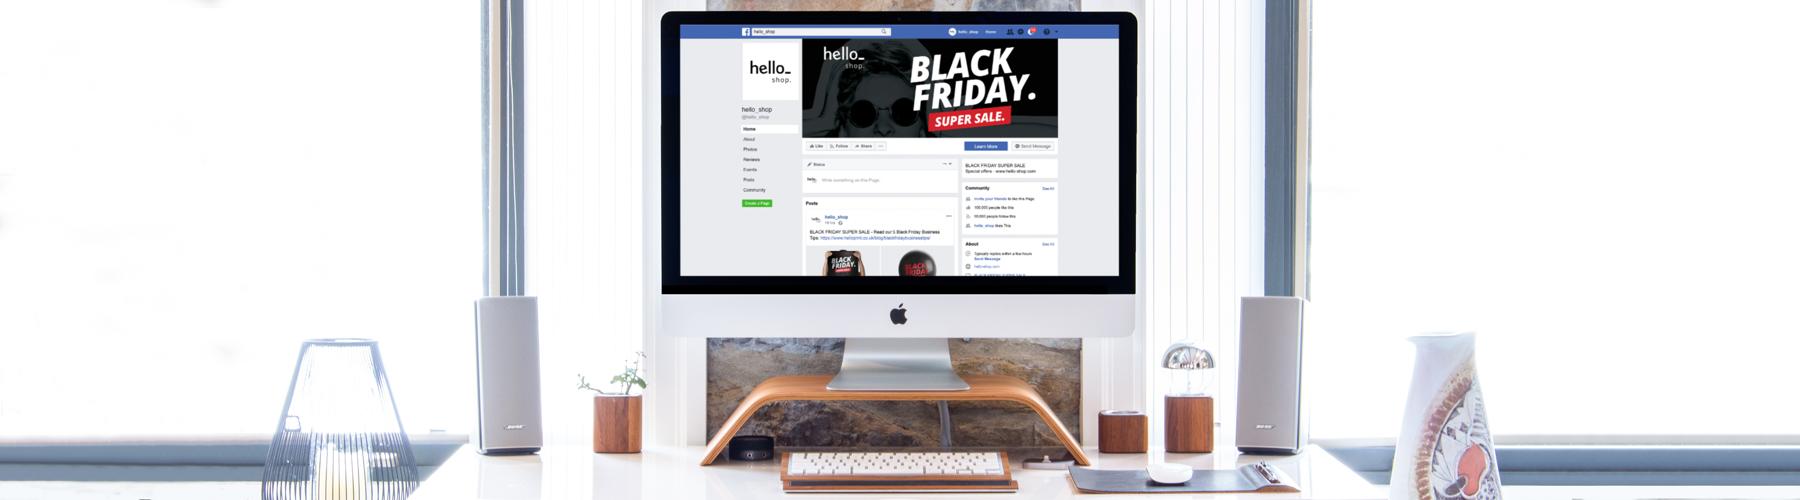 Black Friday : 5 conseils pour booster vos ventes